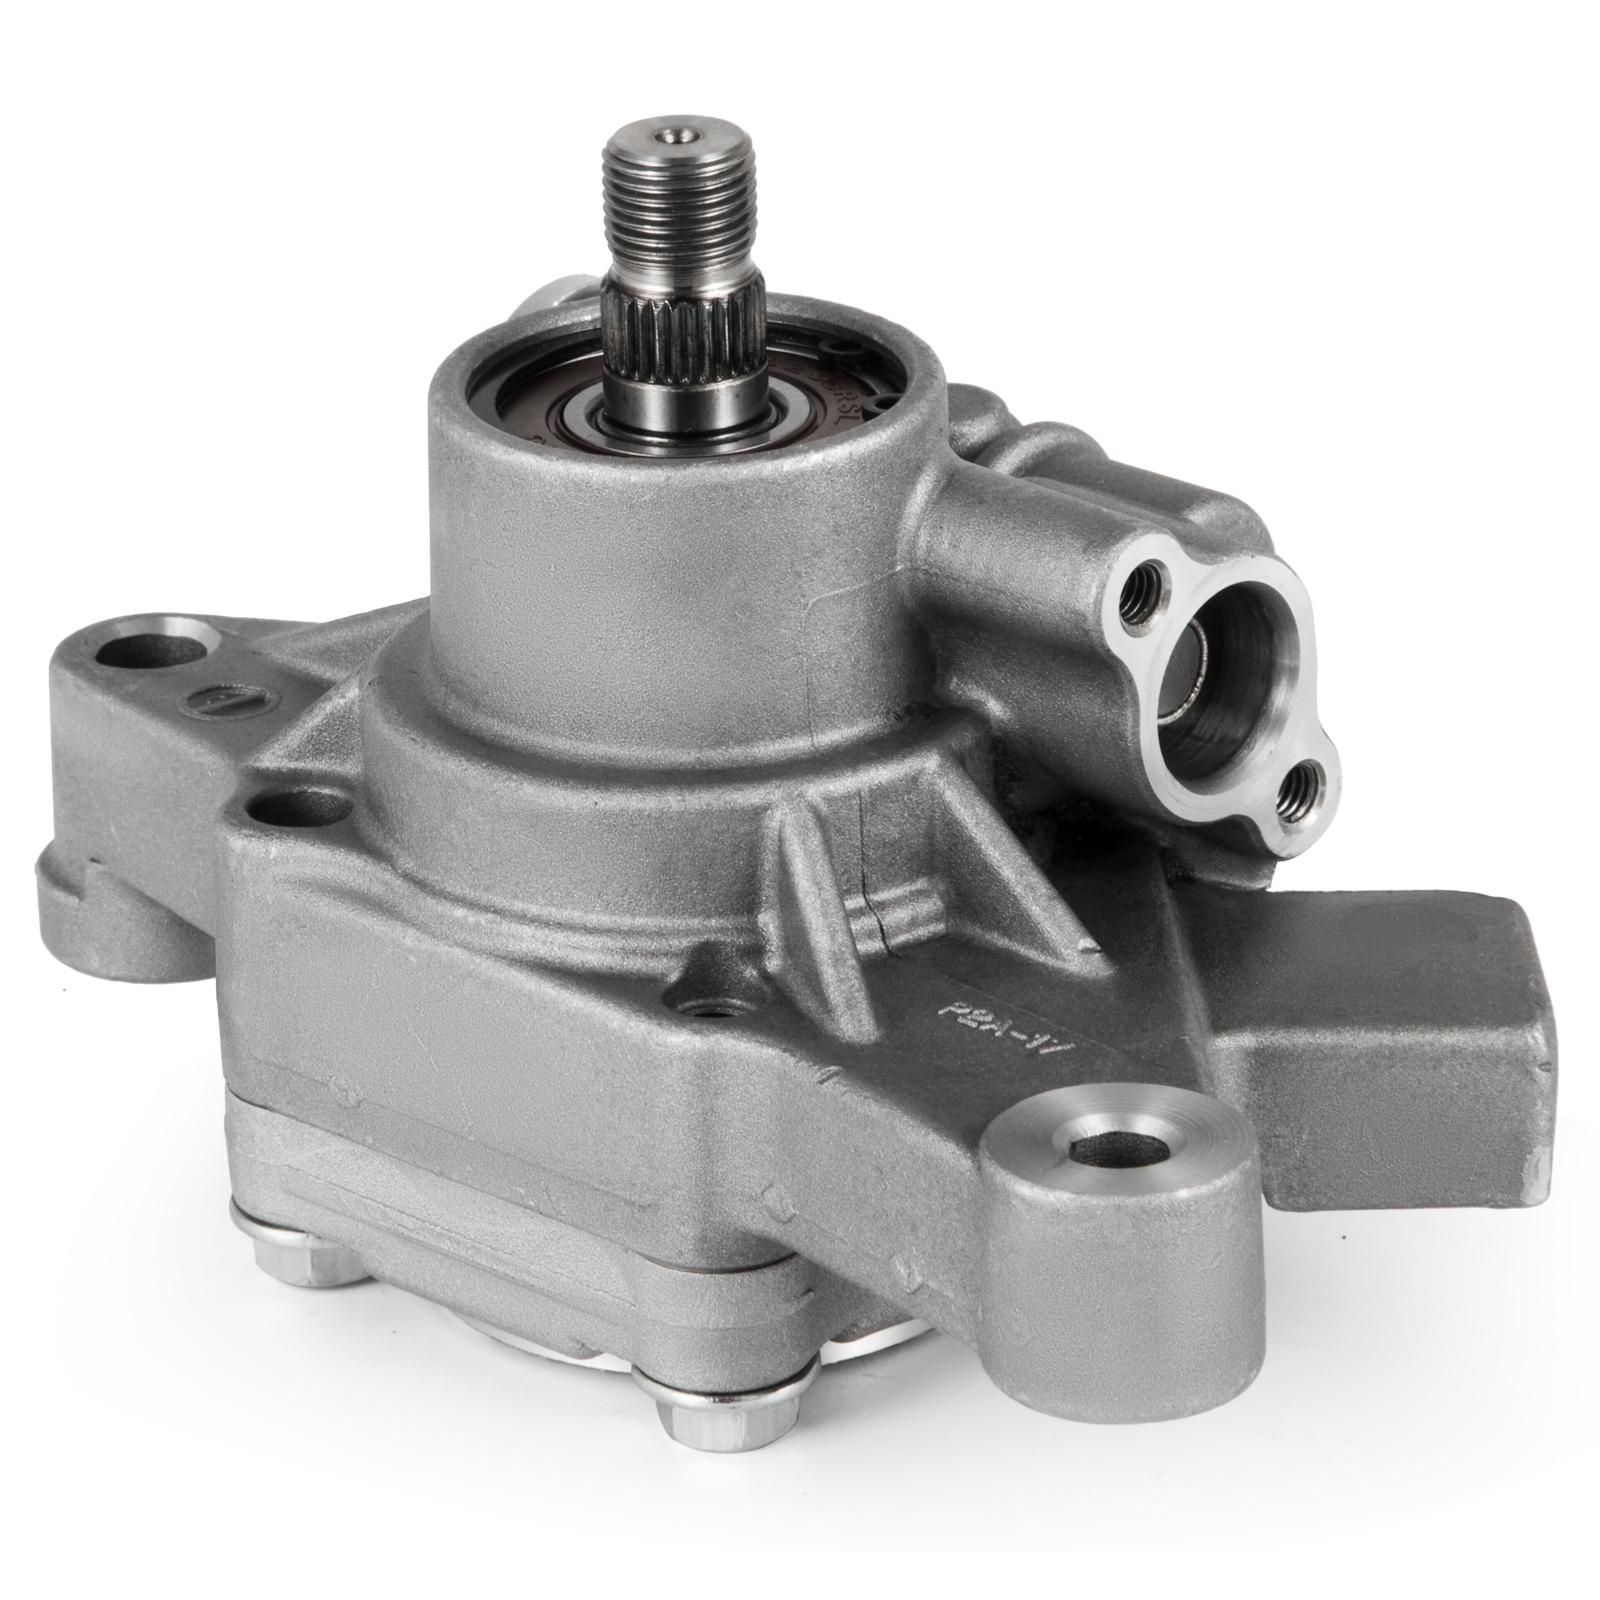 Power Steering Pump For 1996-2001 Honda Civic Acura CR-V